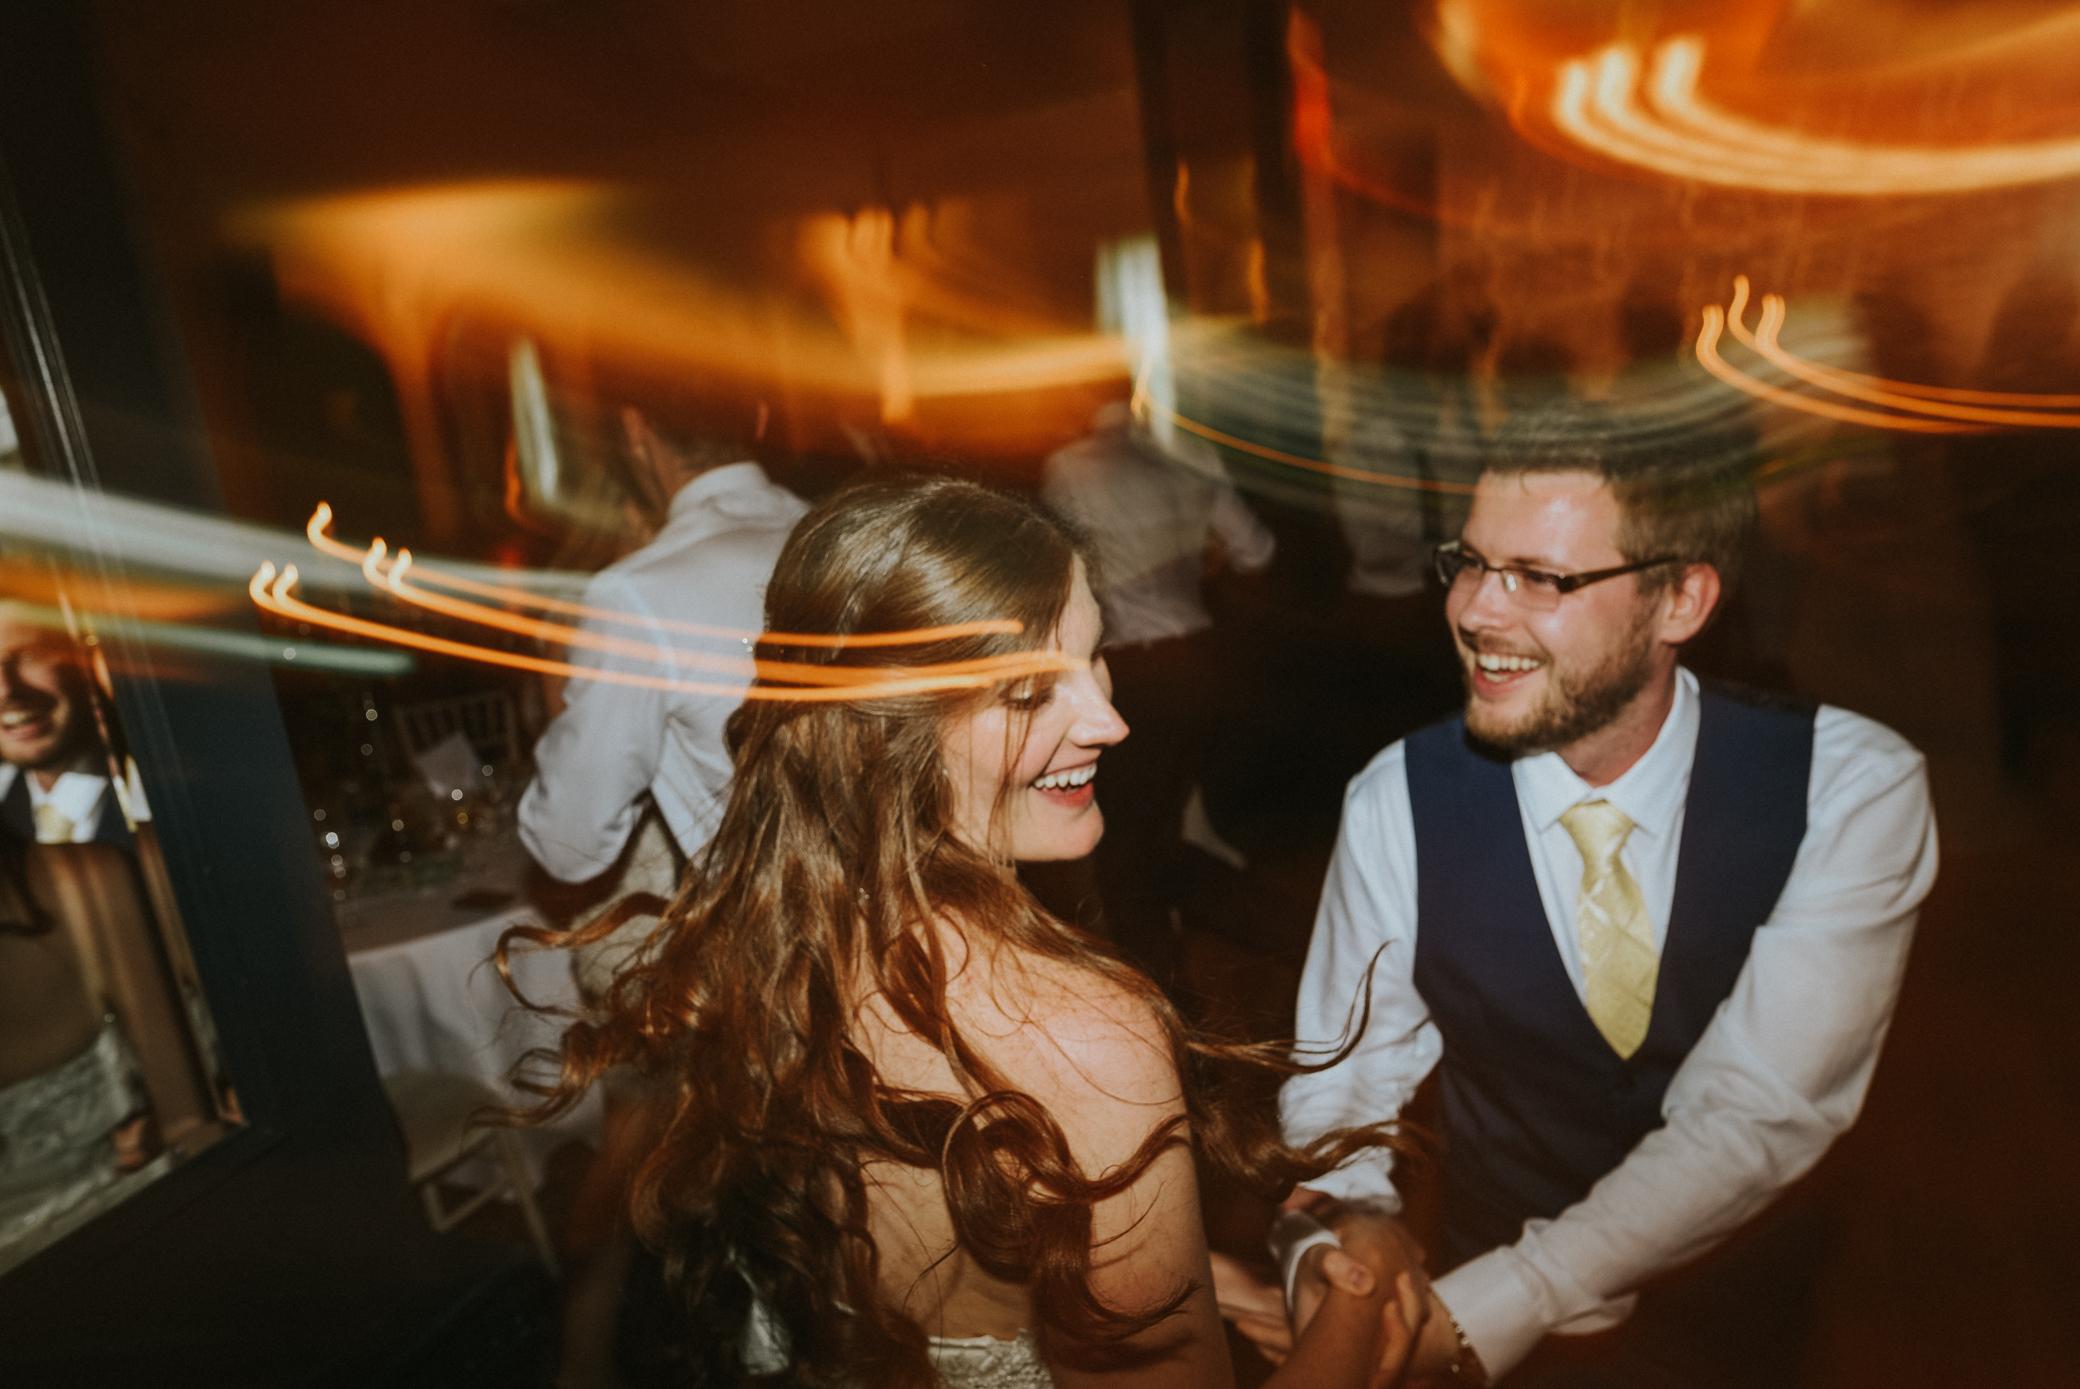 Castletown House - Celbridge Manor Hotel Wedding - Elopement Ireland-20.jpg